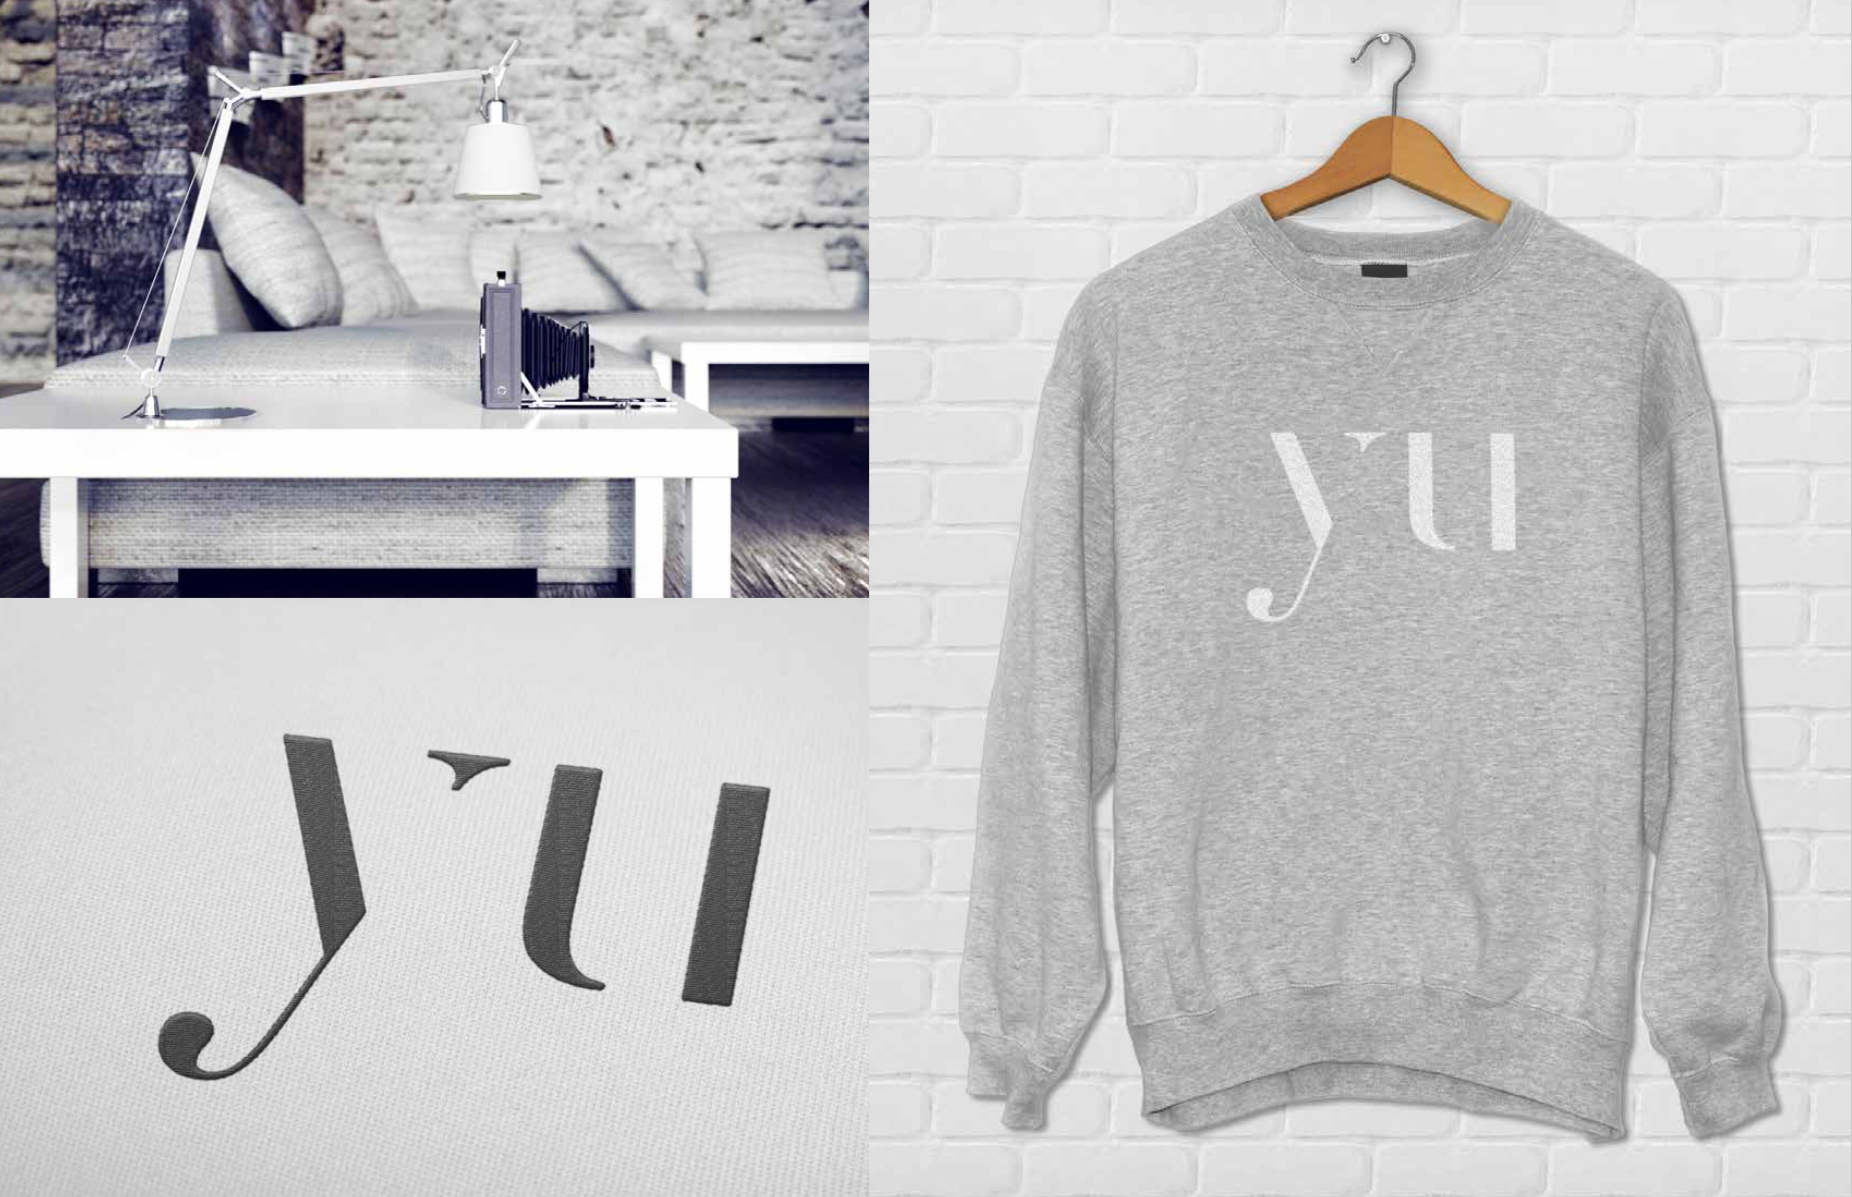 YU-bed-sleep-number-ben-rummel-design-6.png